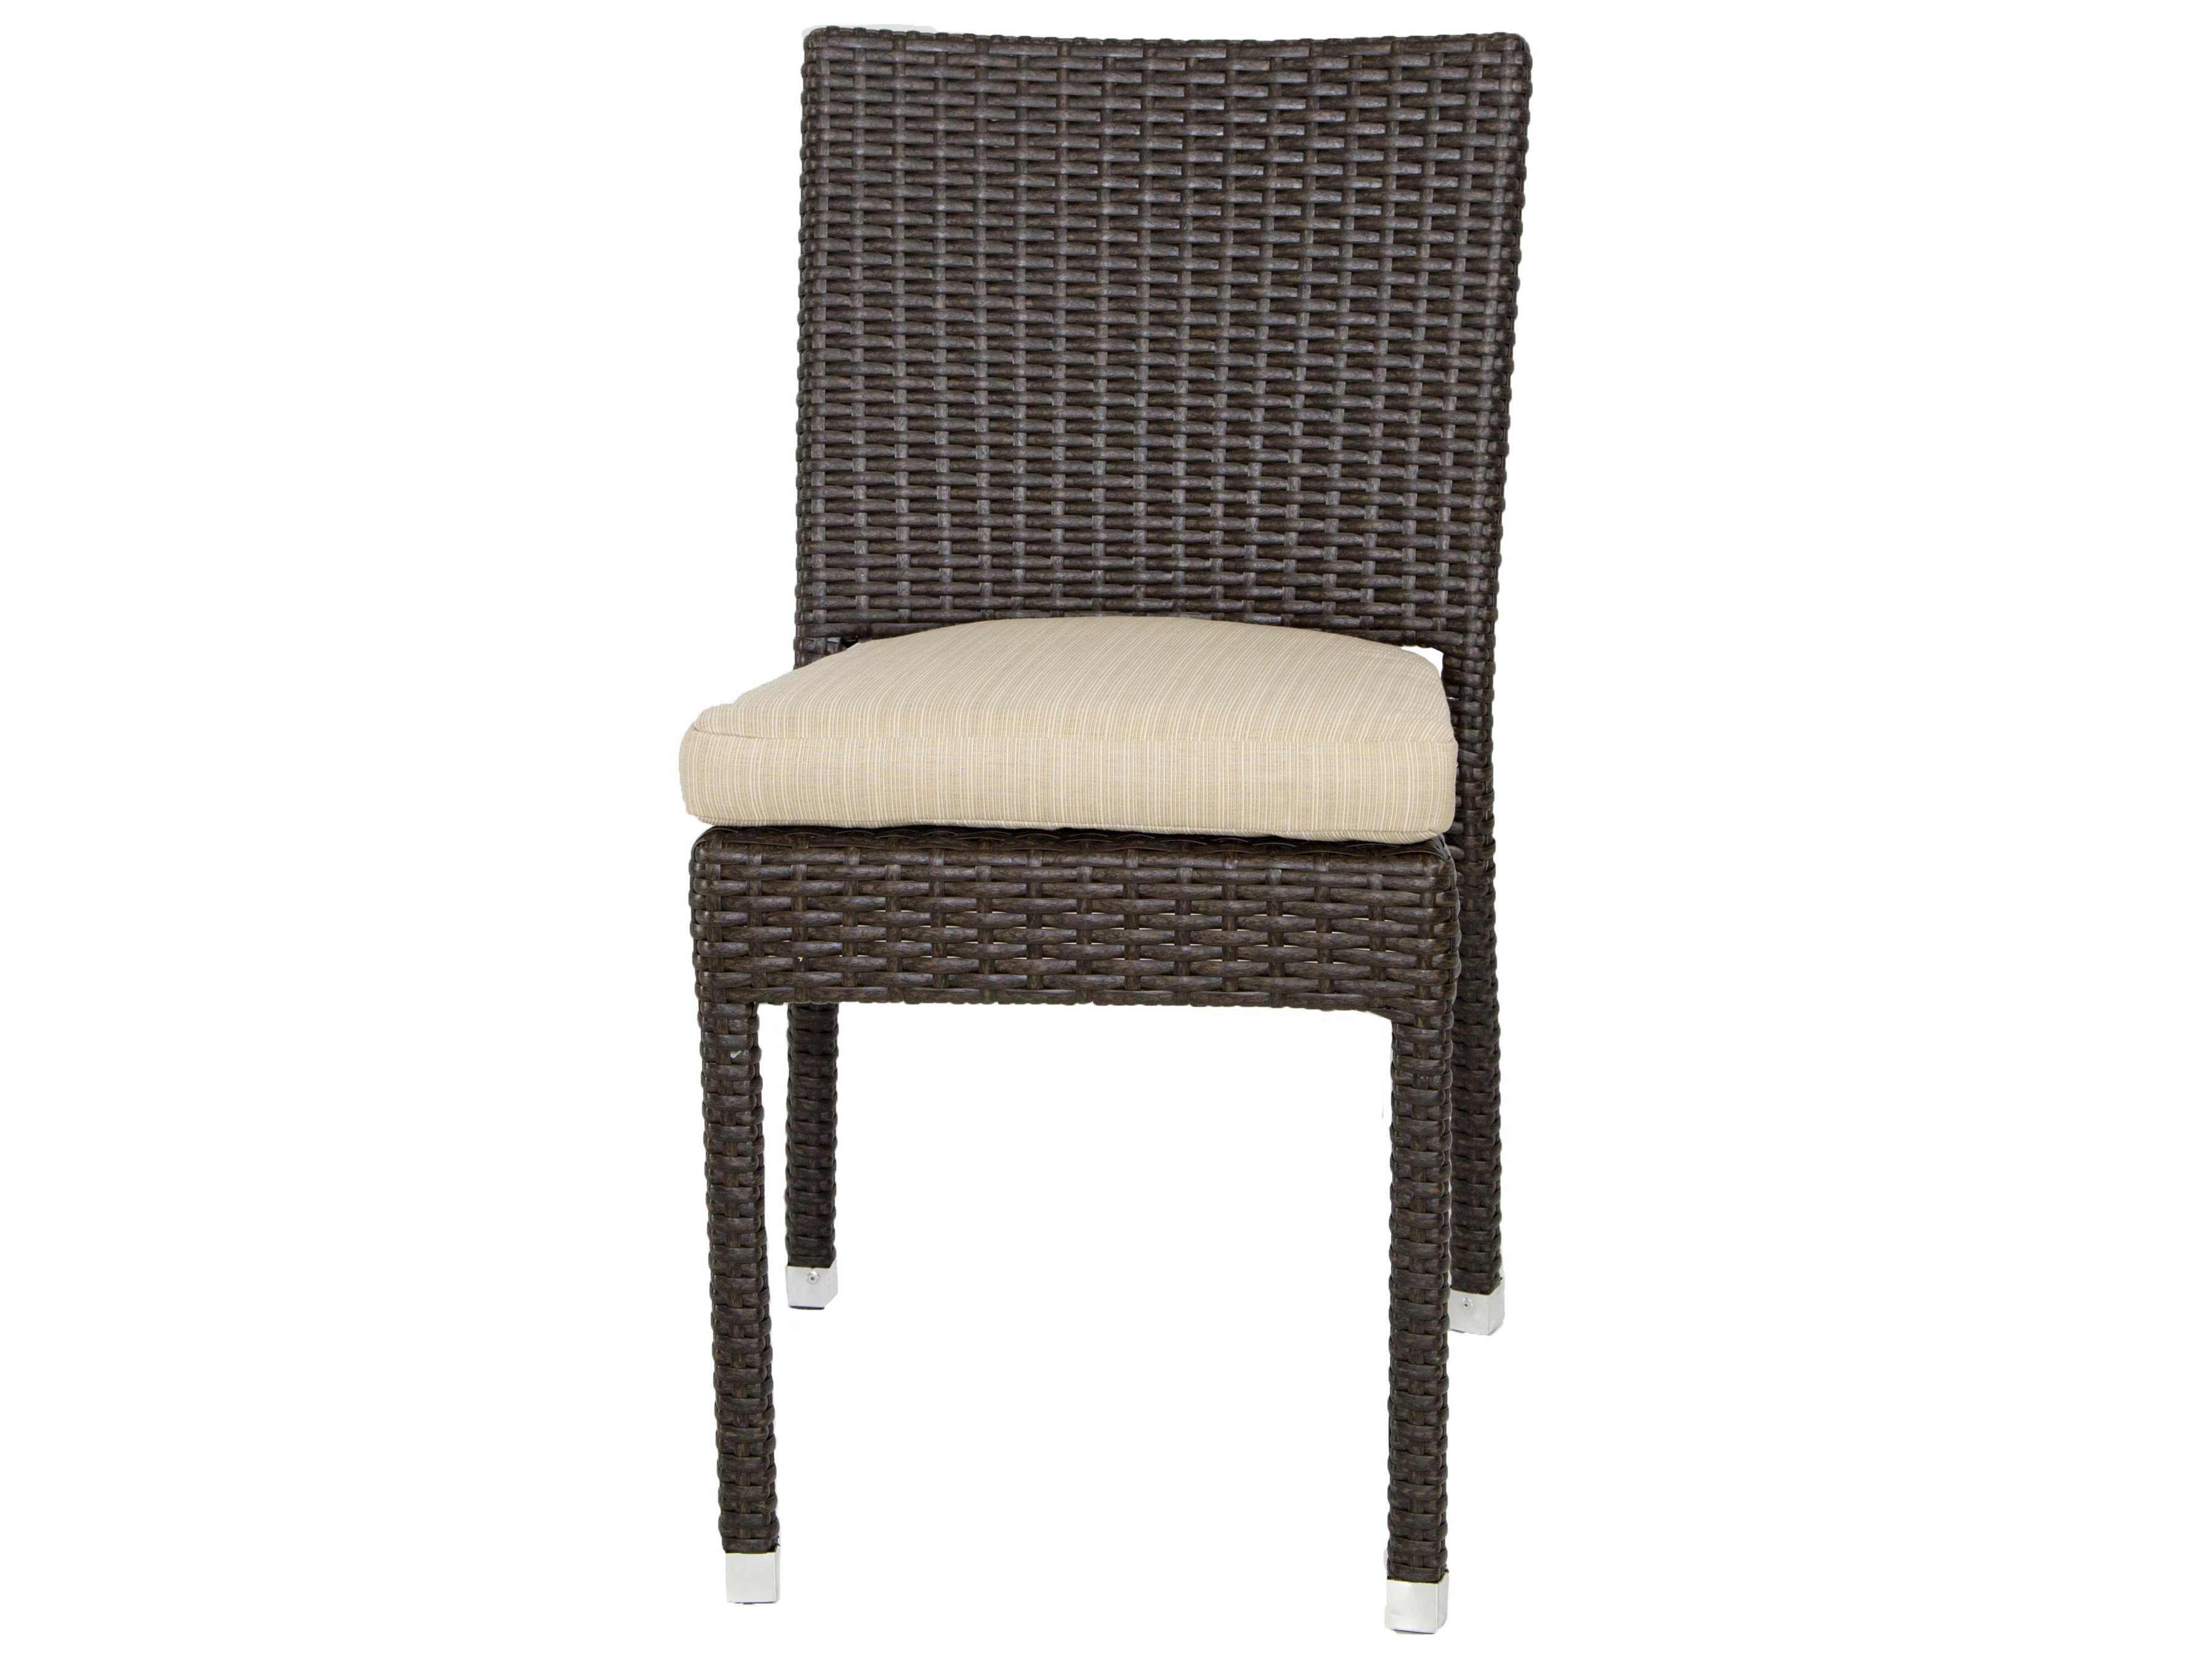 Patio Heaven Venice Zuma Wicker Side Chair Paphzsc